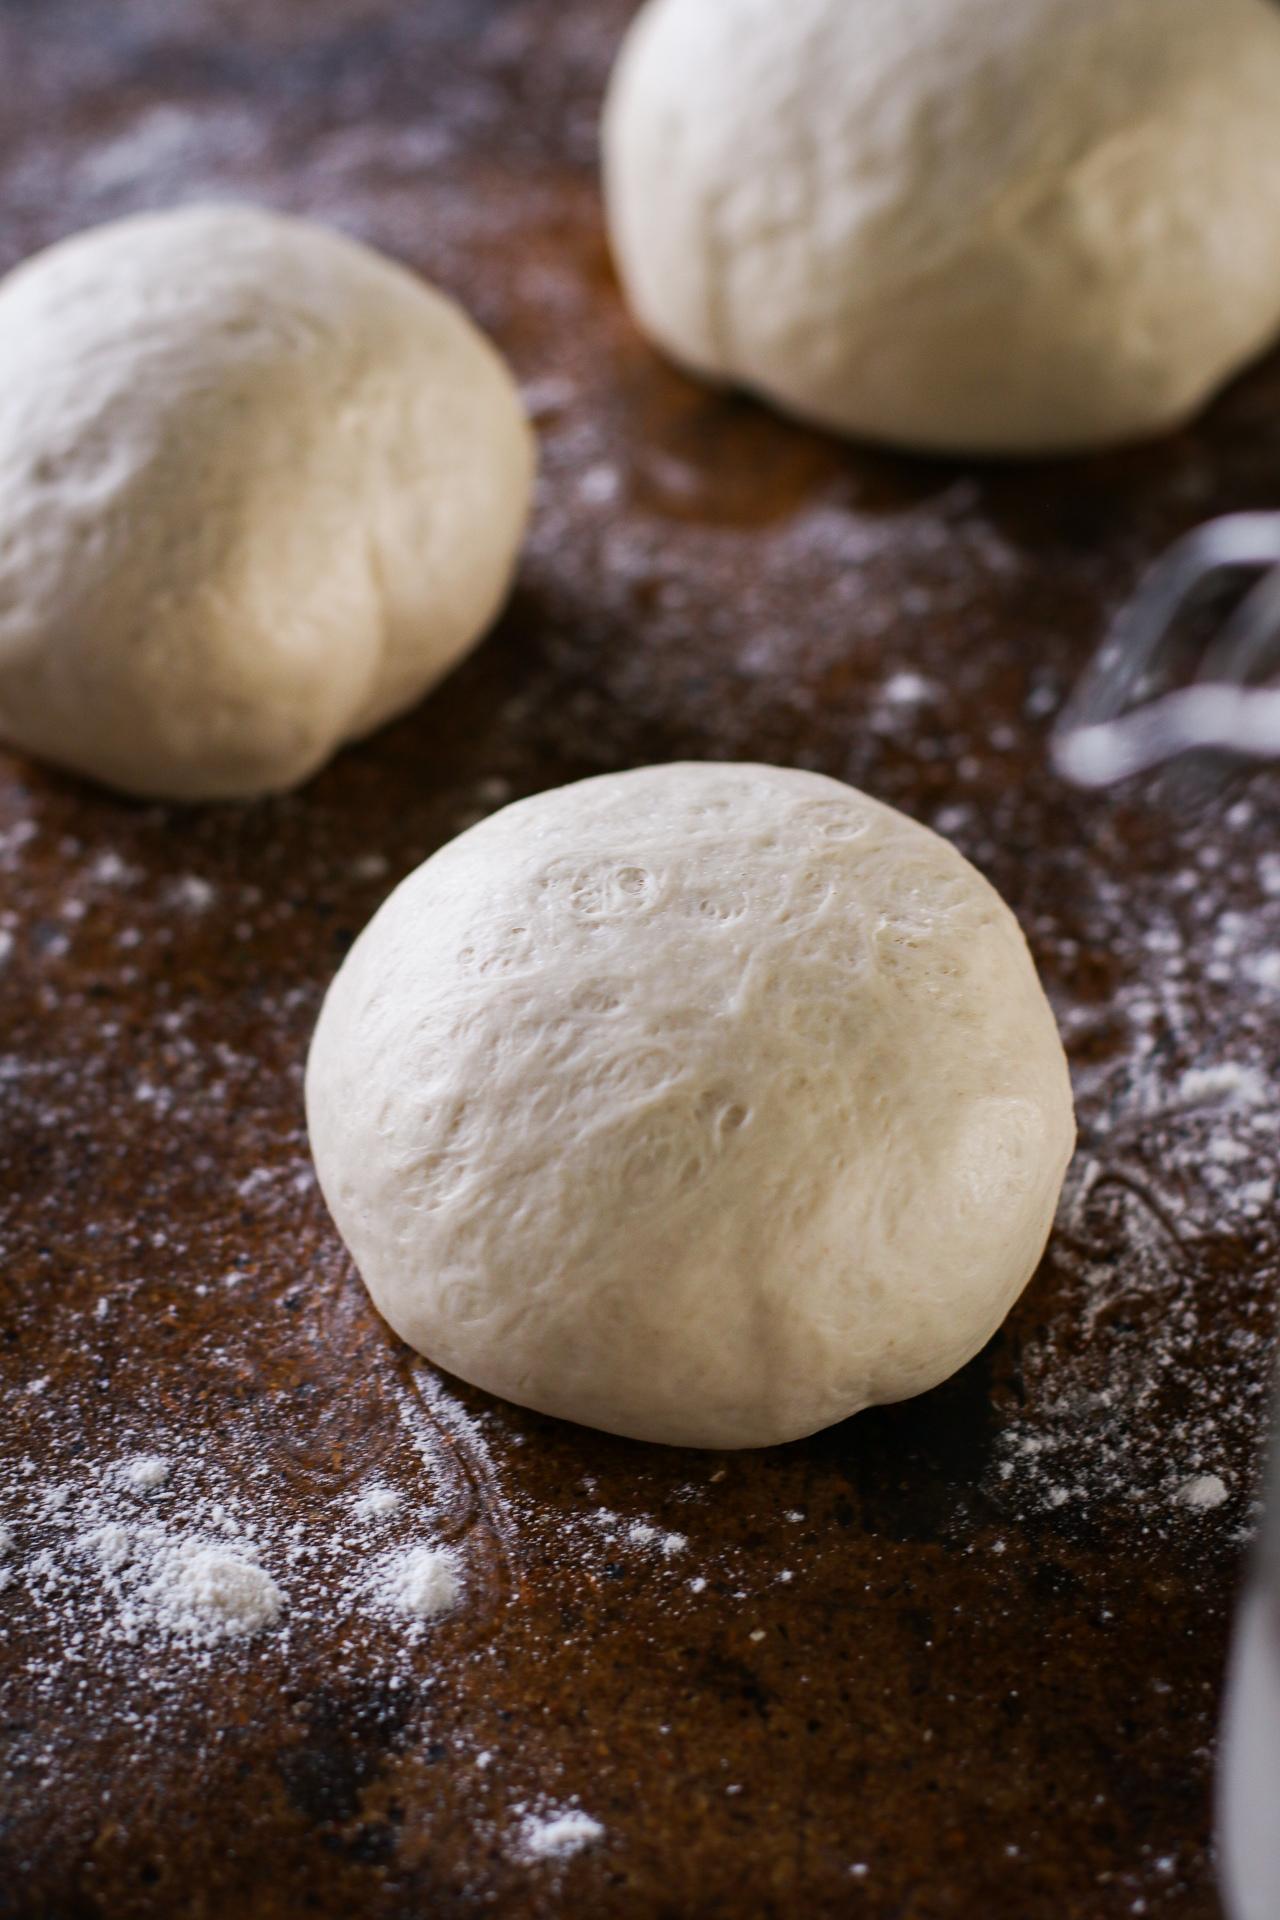 Main image of Homemade Pizza Dough